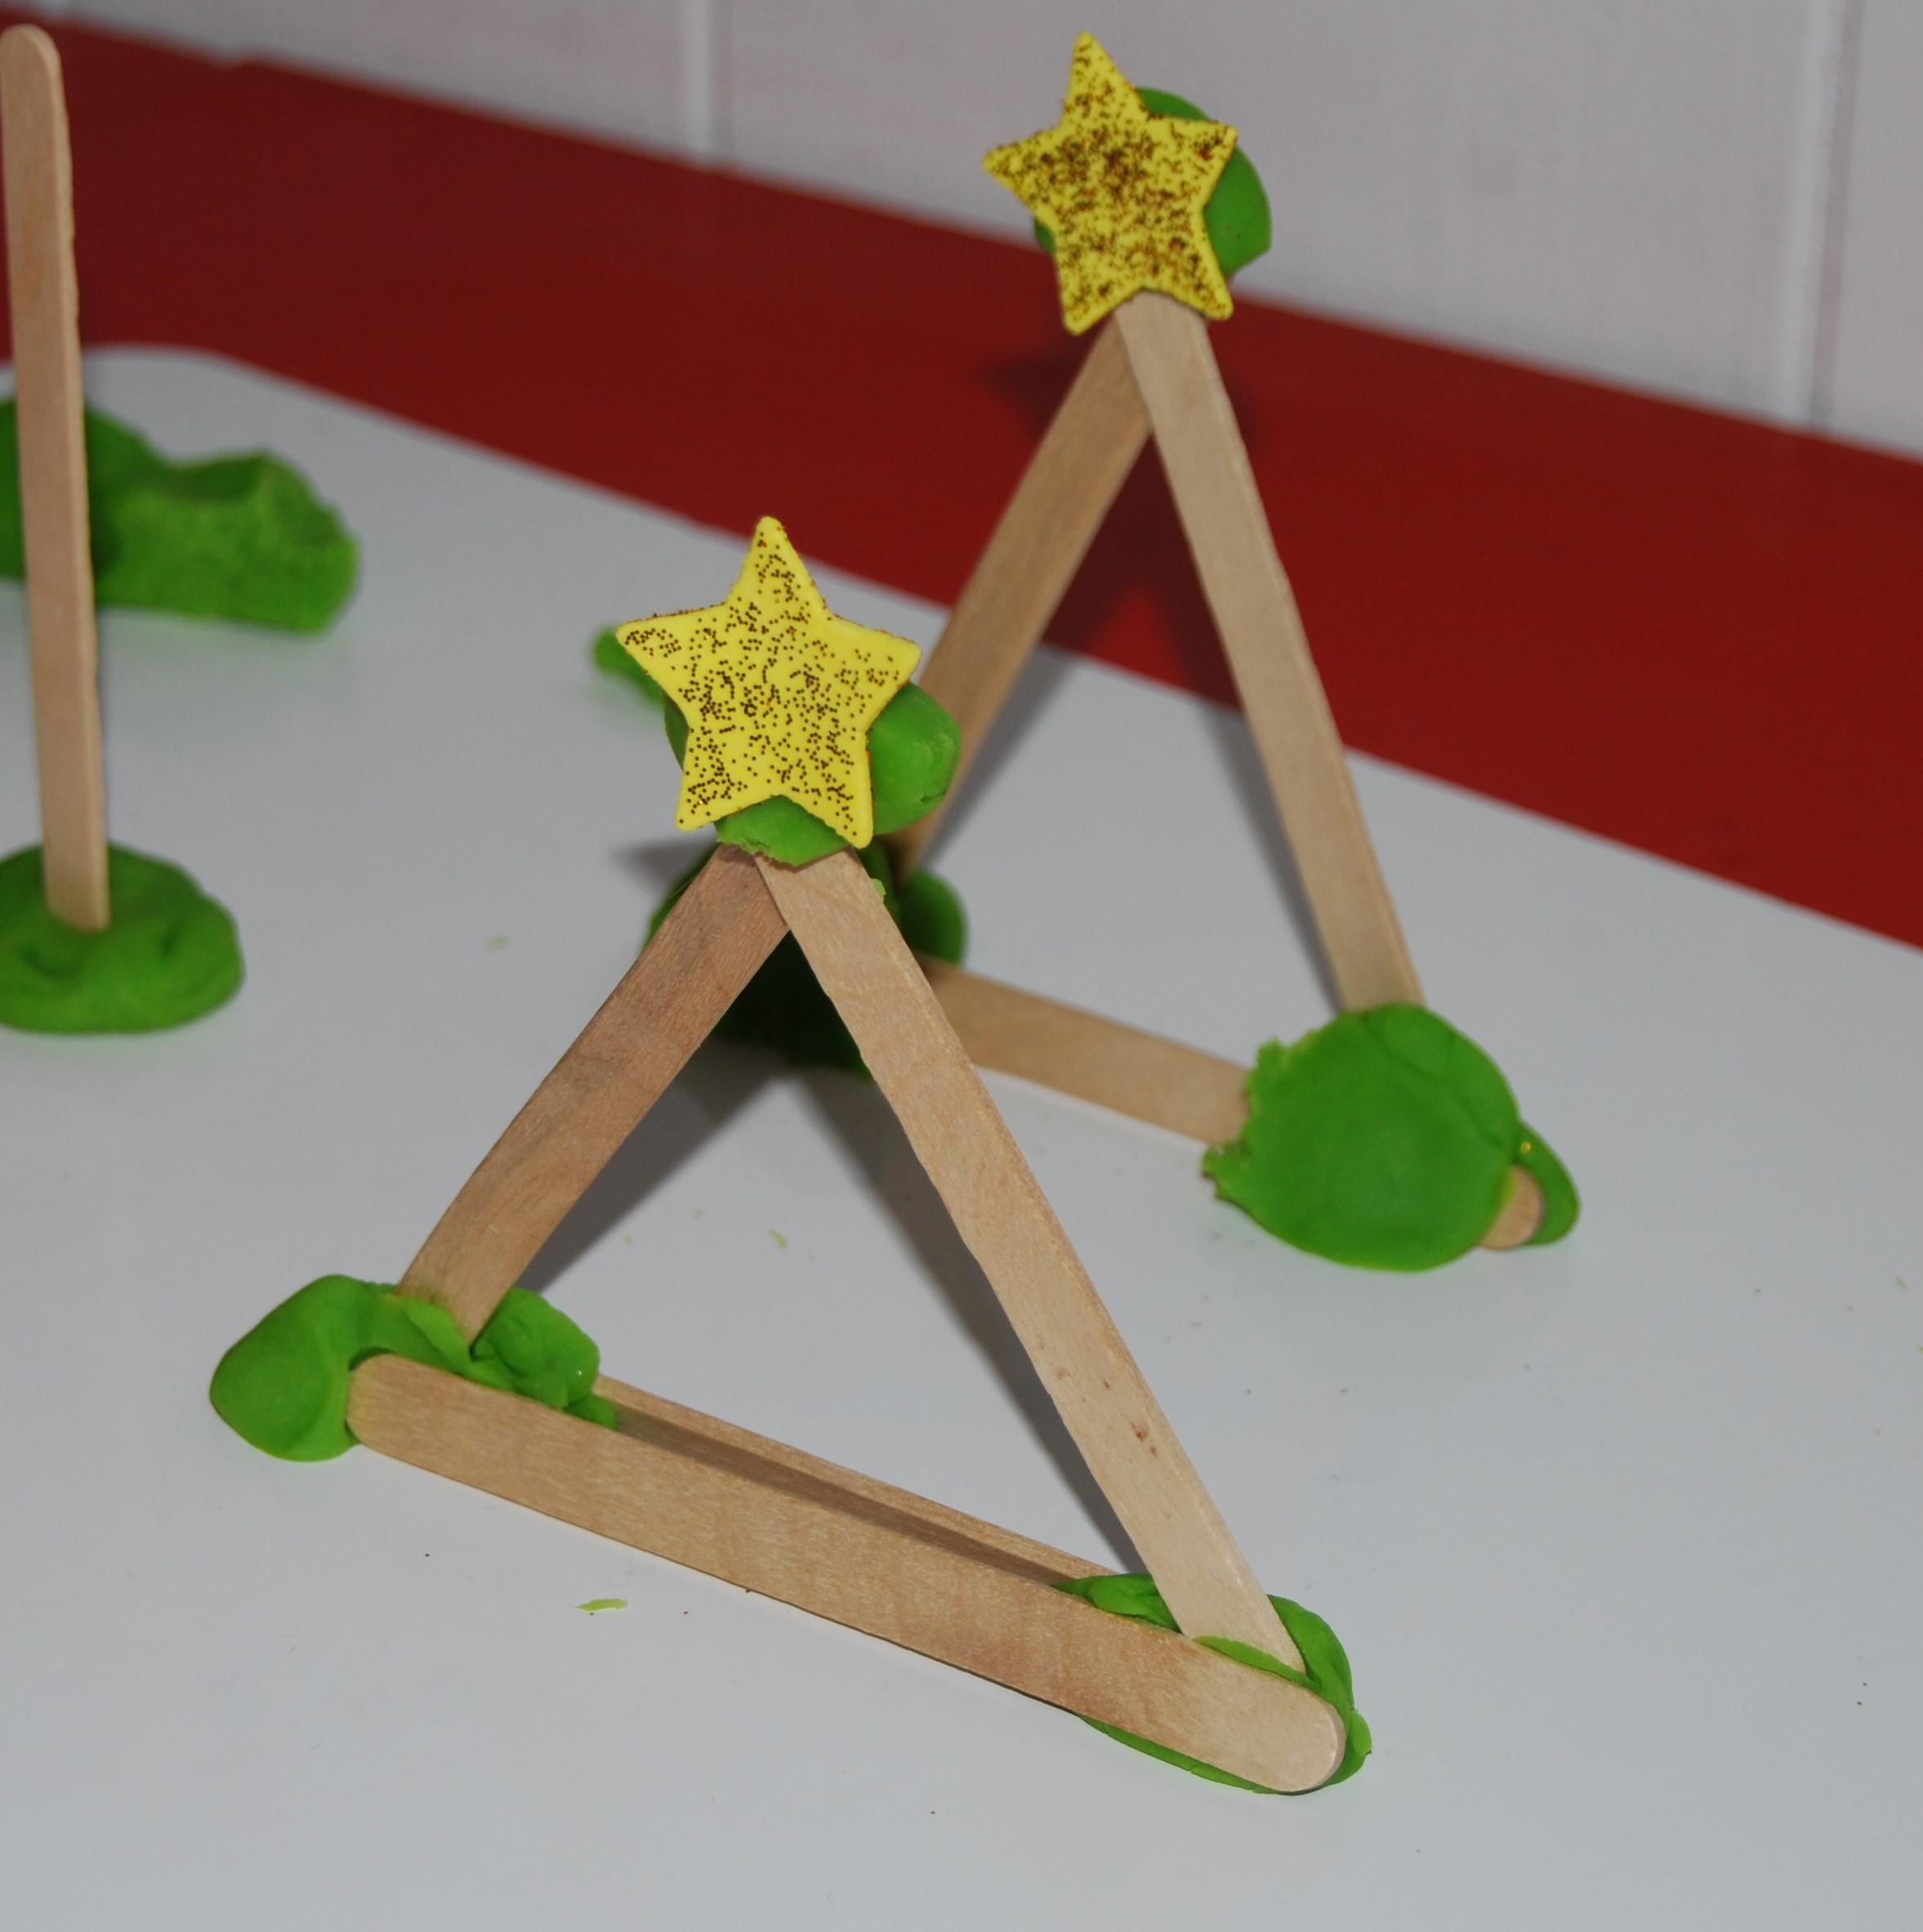 Winter Stem Activity For Preschool Evergreen Tree Building Challenge The Preschool Toolbox Blog